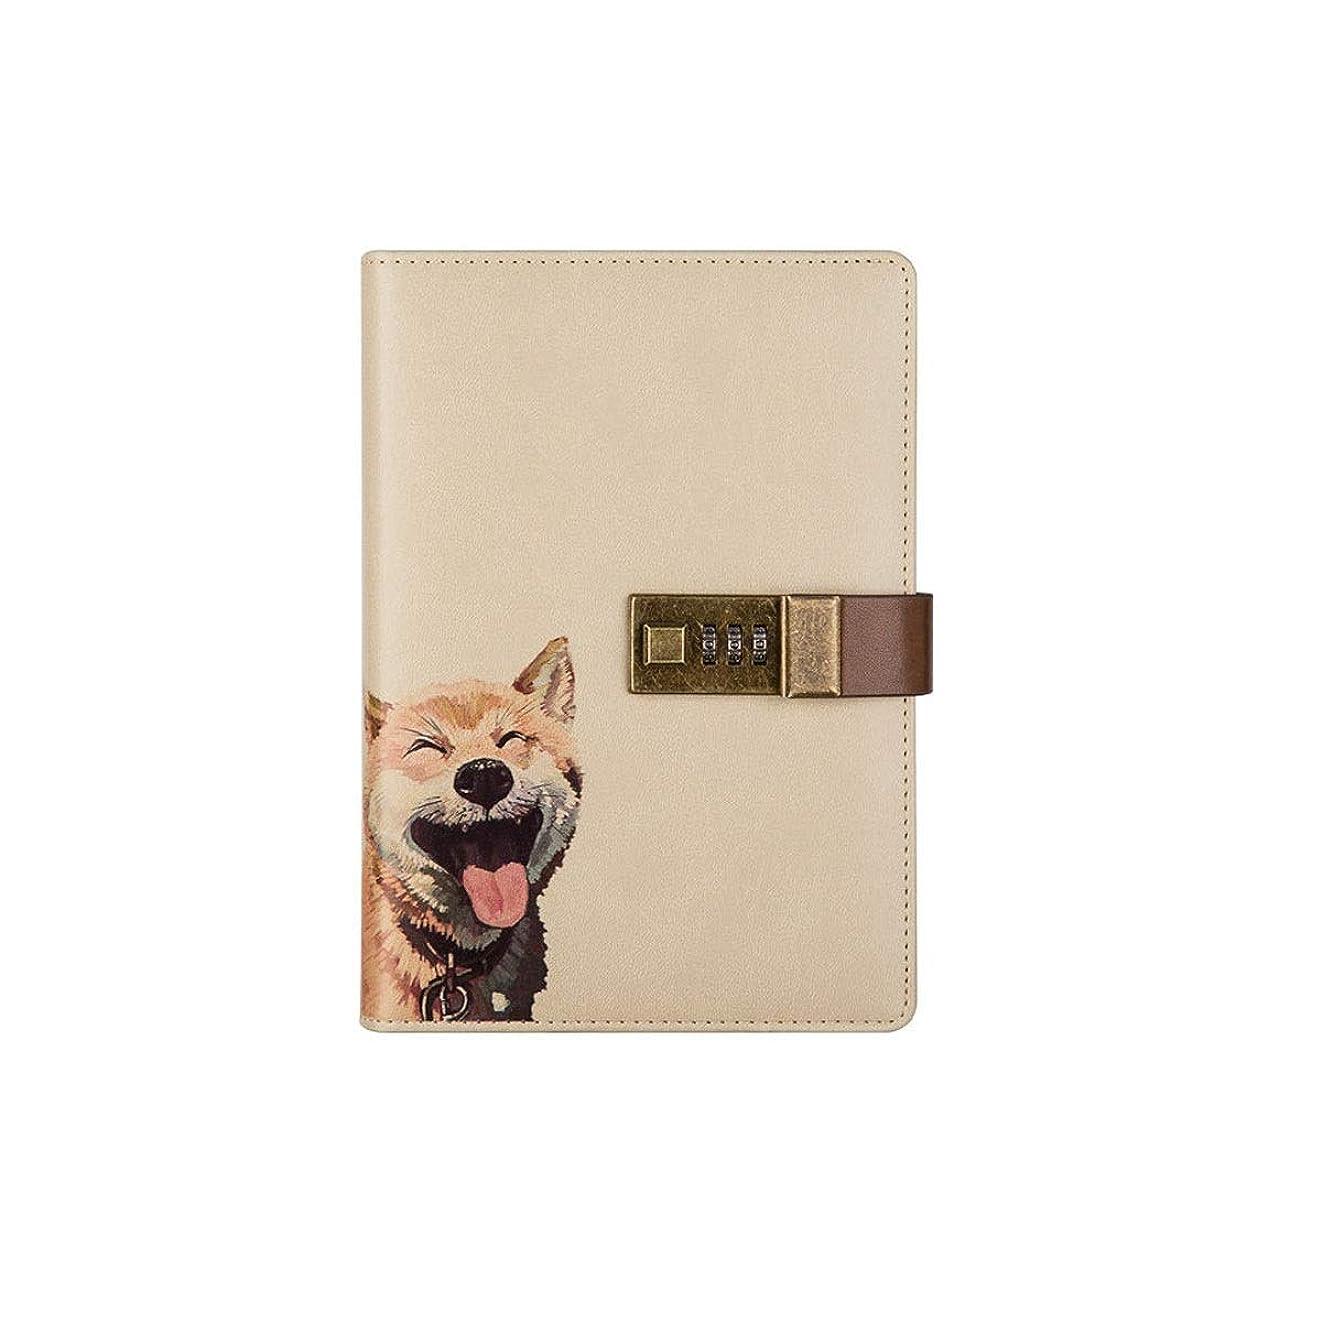 JINSHANDIANLIAO ギフトノートとペンセットギフトボックス、ノートブックセット、ホリデーギフト、秘密のコードロック日記、レトロなデザインのノート、簿記ノート、複数の種類 高品質の事務用品 (Style : C)